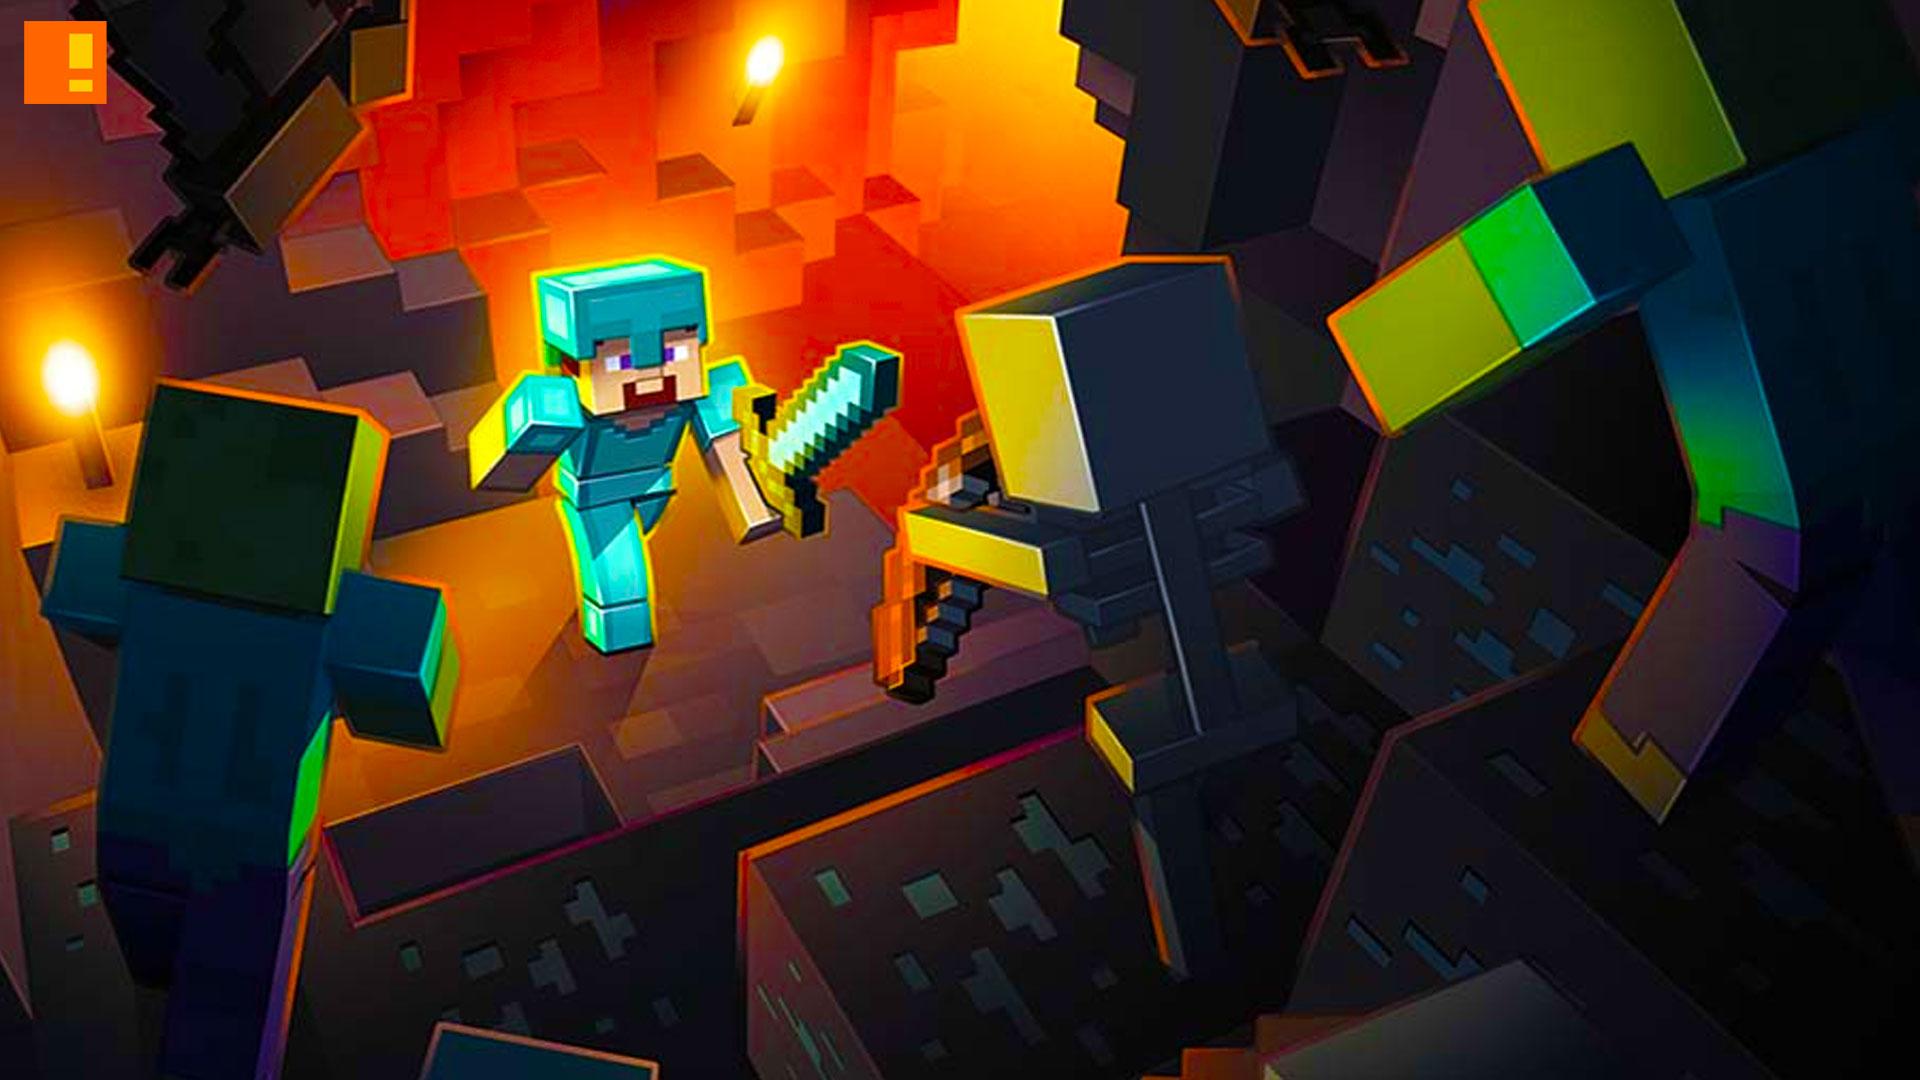 minecraft, the action pixel, entertainment on tap, warner bros. , mojang, @theactionpixel